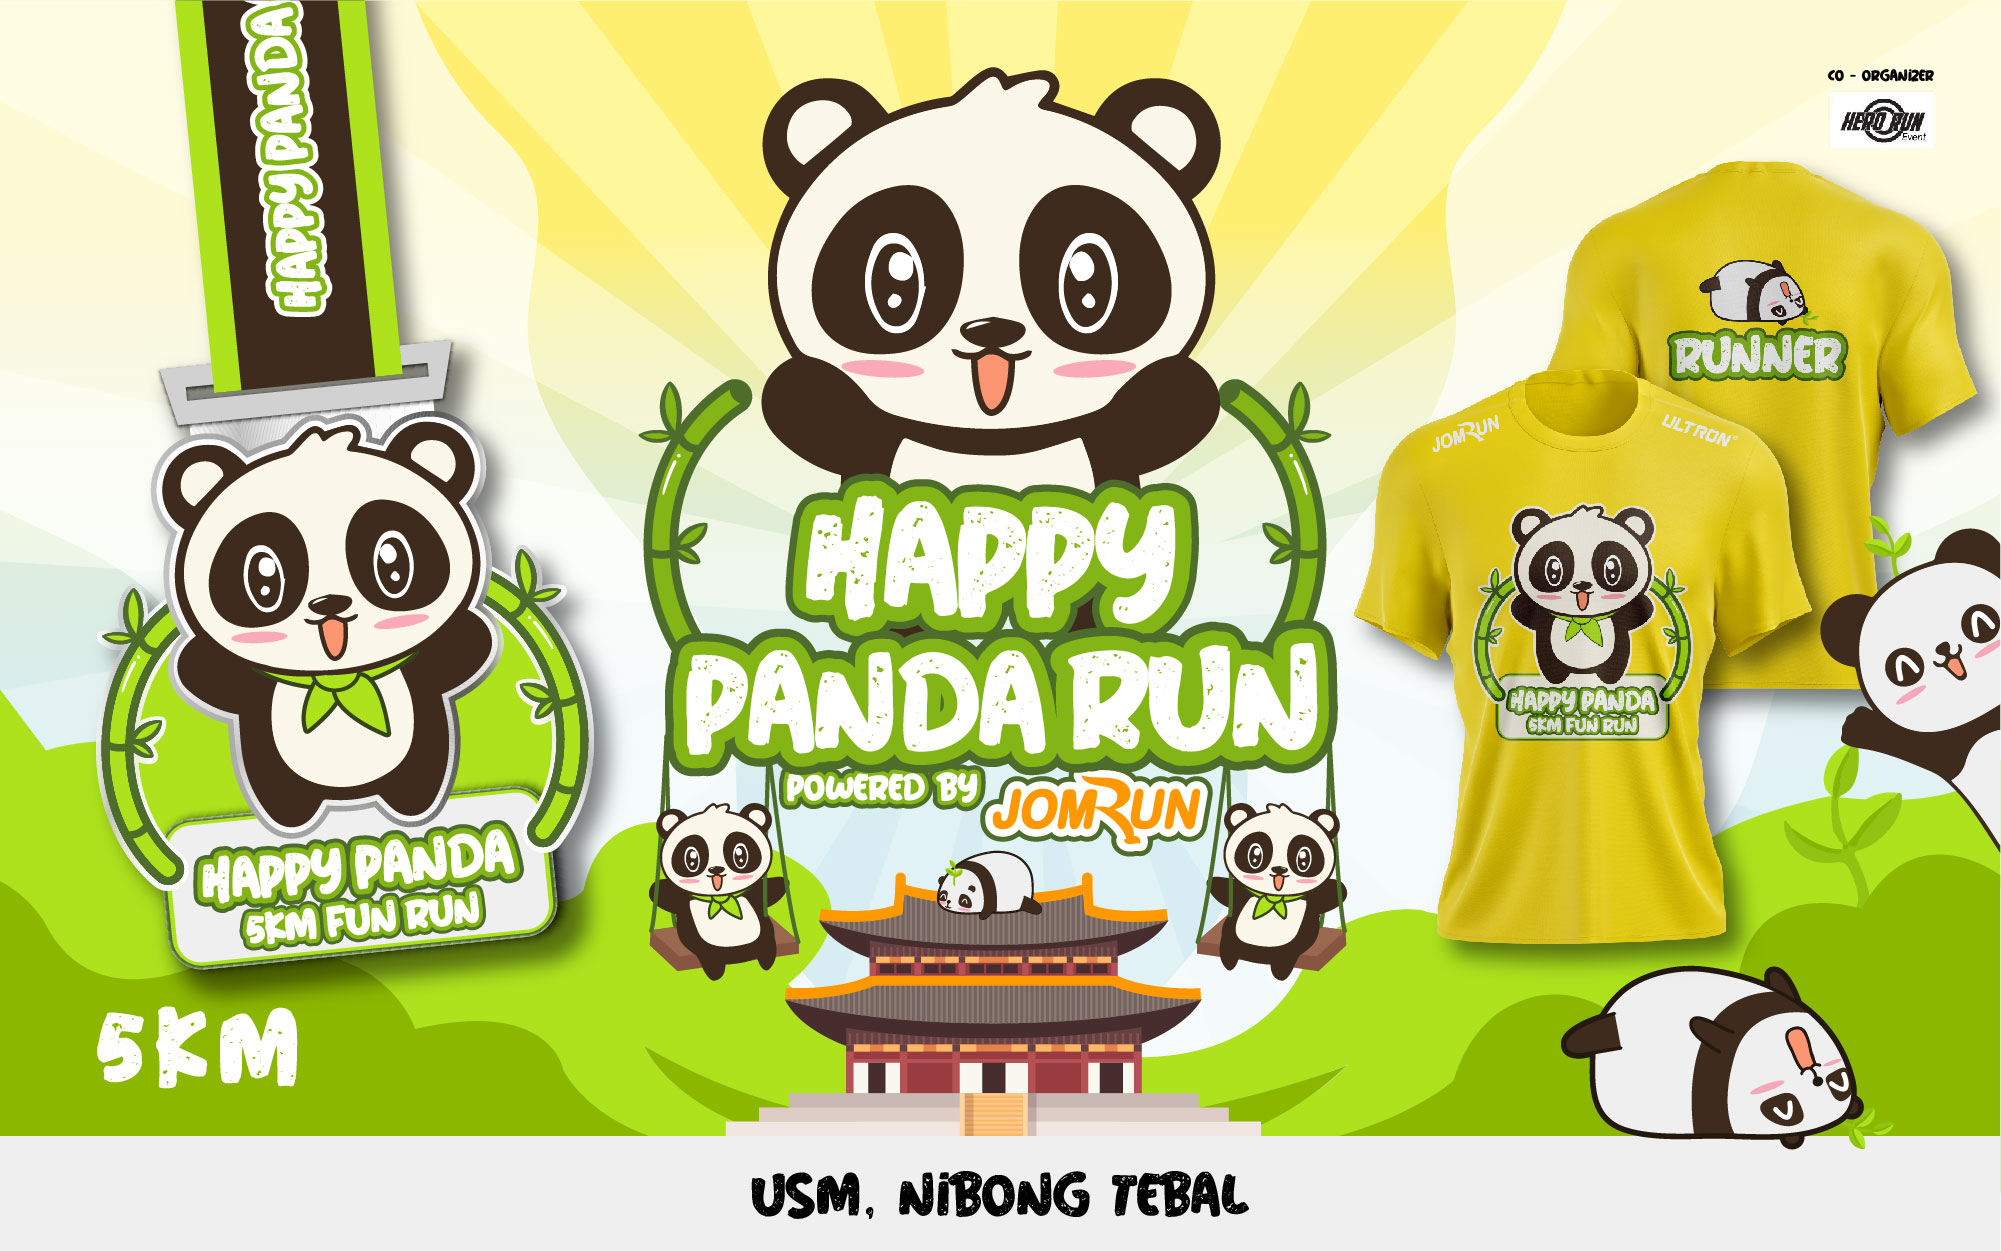 Nibong Tebal Happy Panda 5KM Fun Run (Event Cancelled)